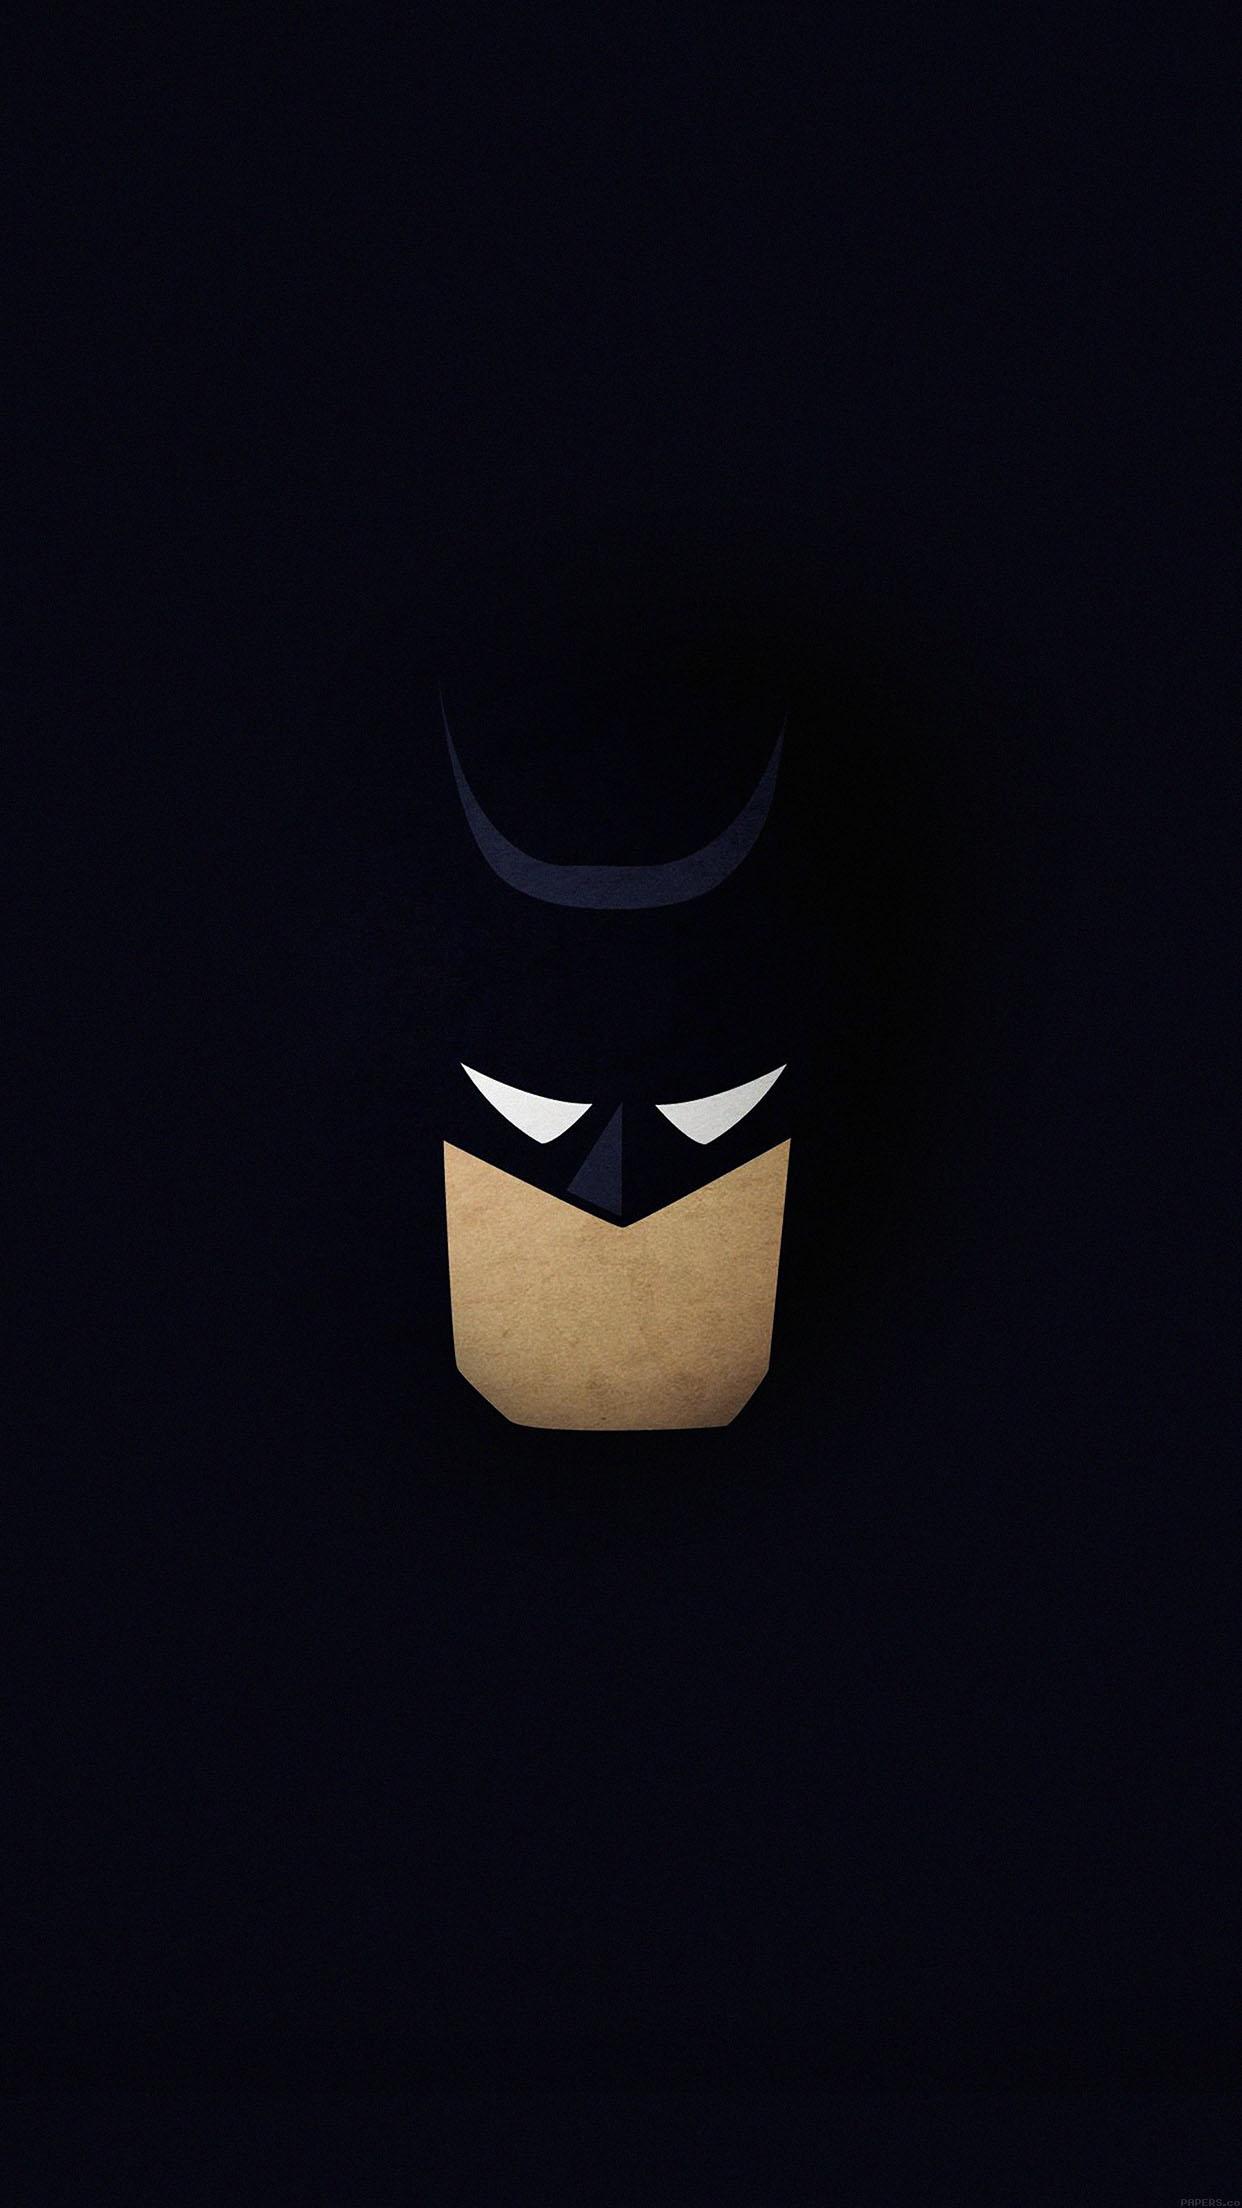 Ab54 Wallpaper Batman Face Dark Minimal Papers Co